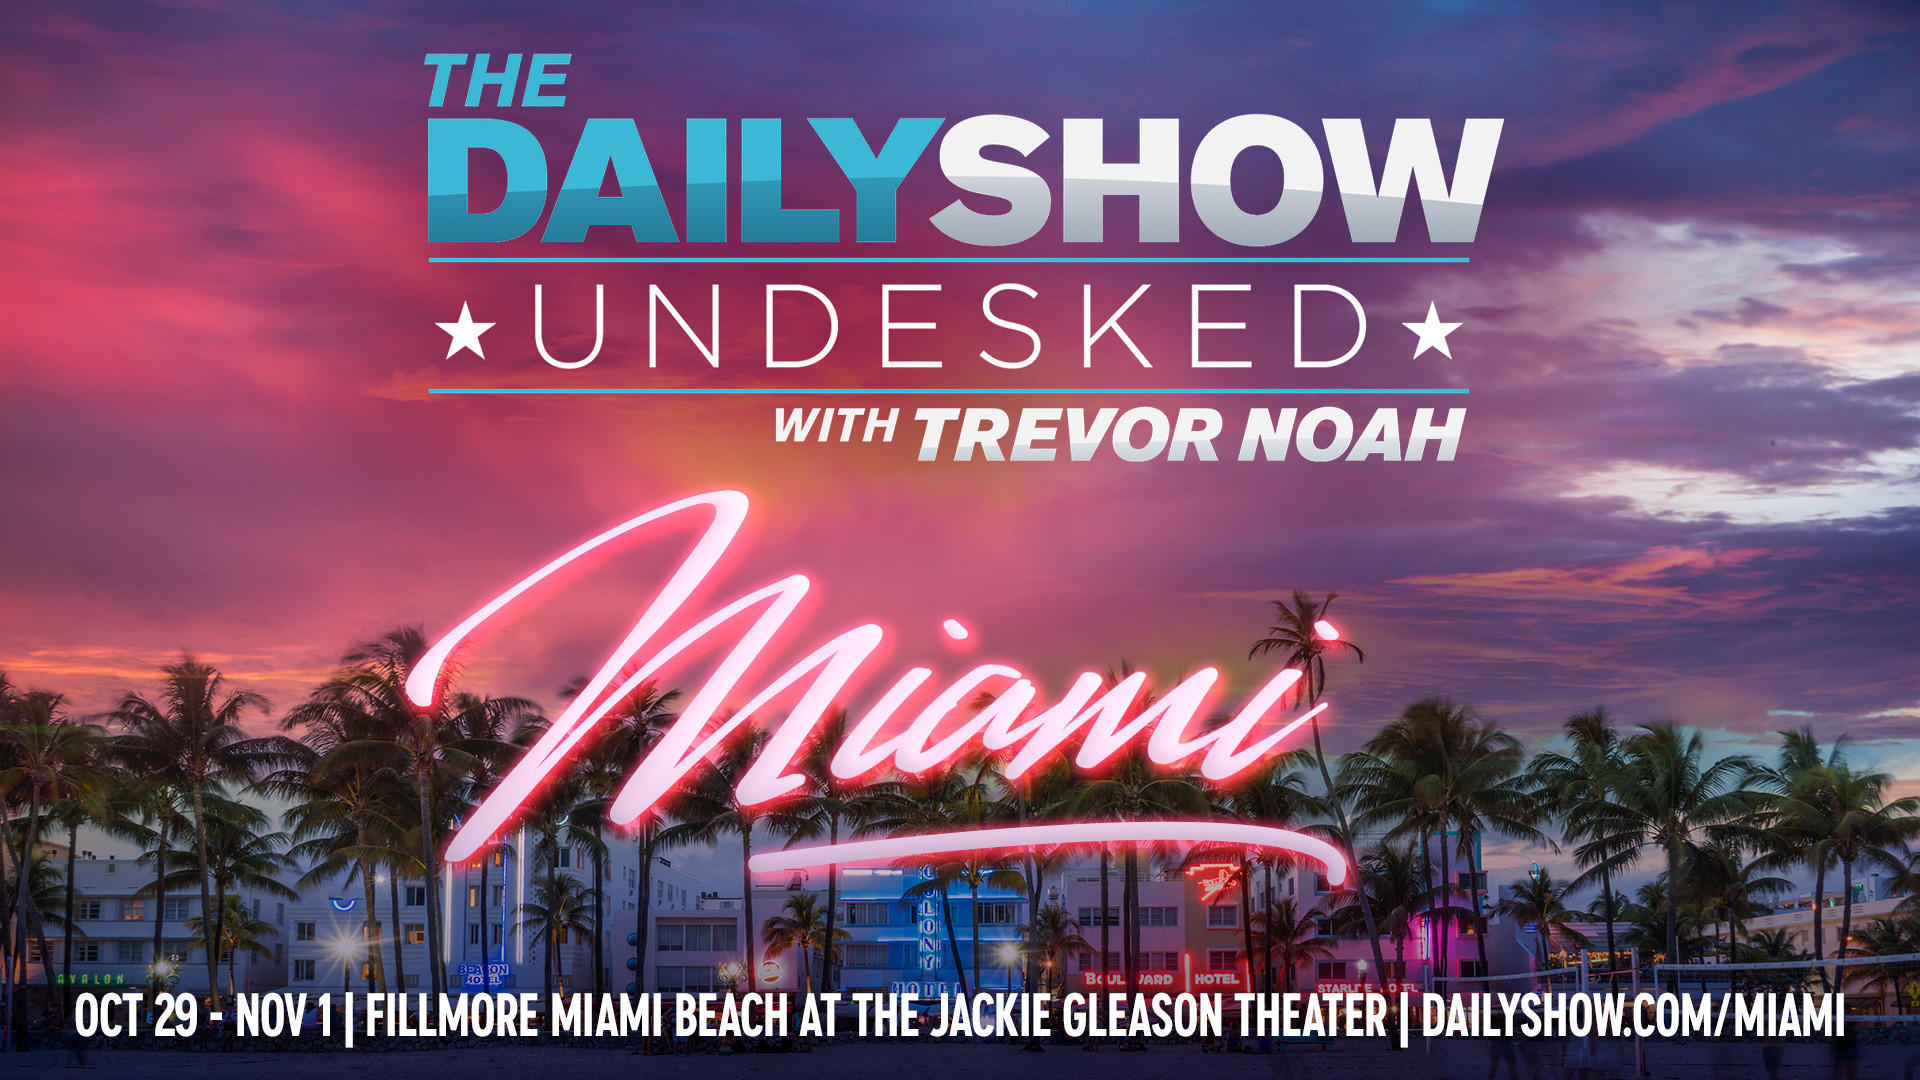 Daily Show With Trevor Noah Heads To Miami Beach